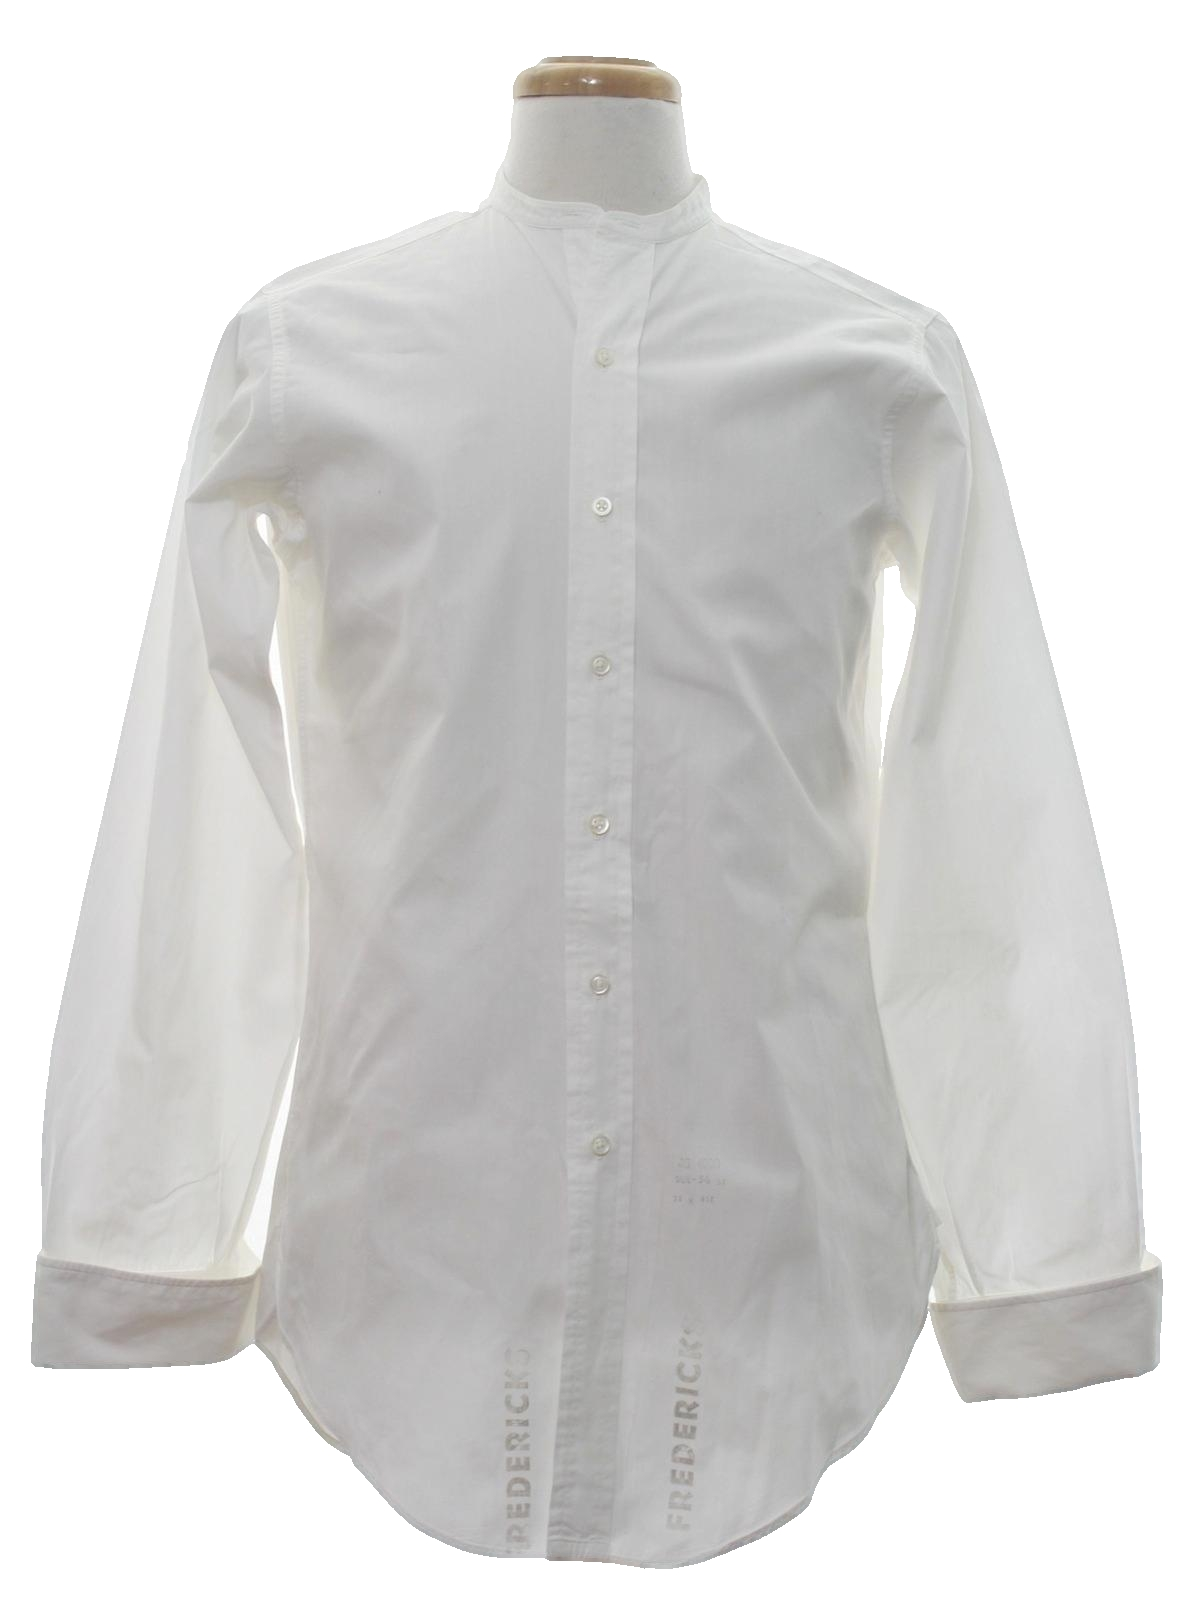 40 39 S Viking National Shirt Shops Shirt 40s Viking